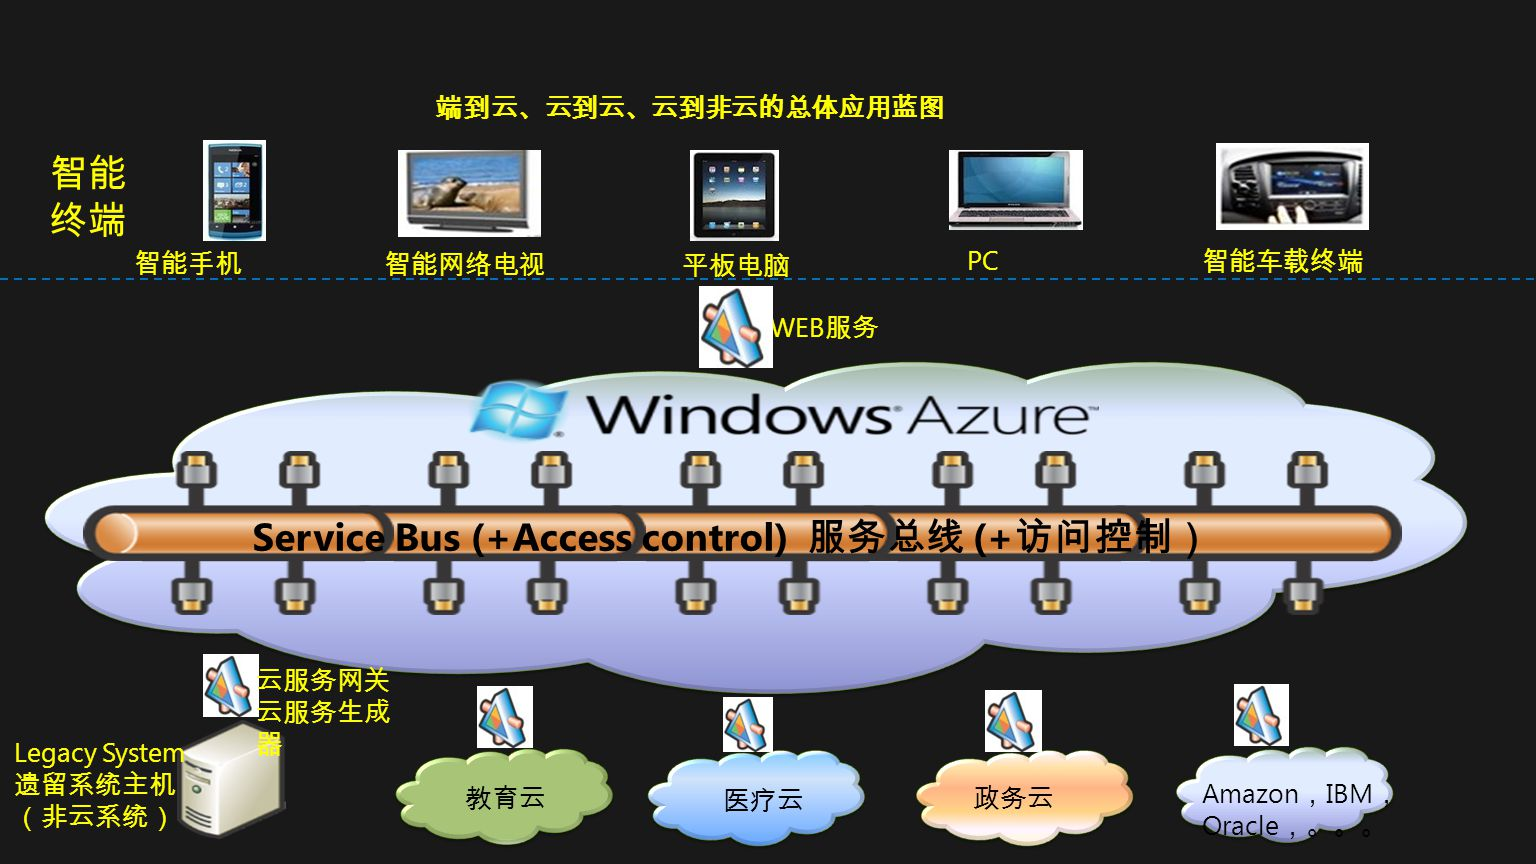 Service Bus (+Access control) 服务总线 (+访问控制)